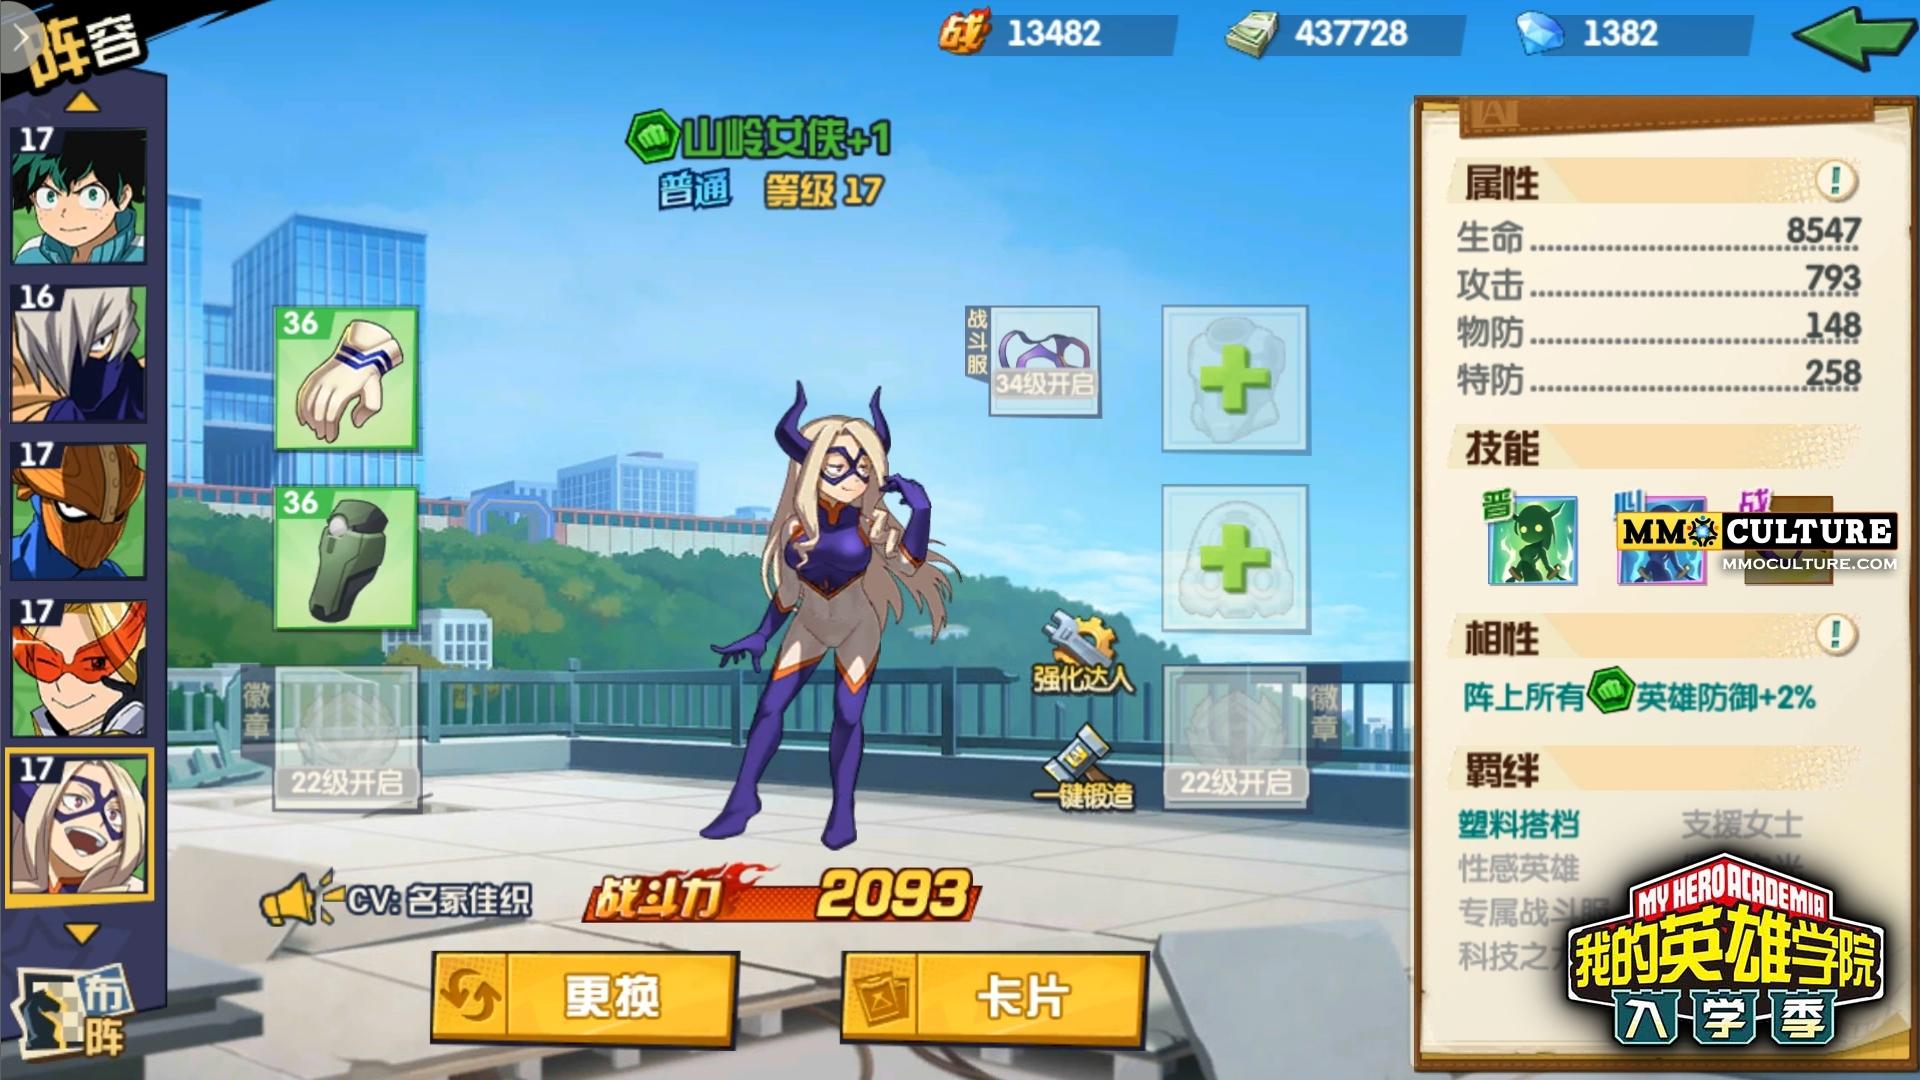 My Hero Academia Mobile 2842019 3